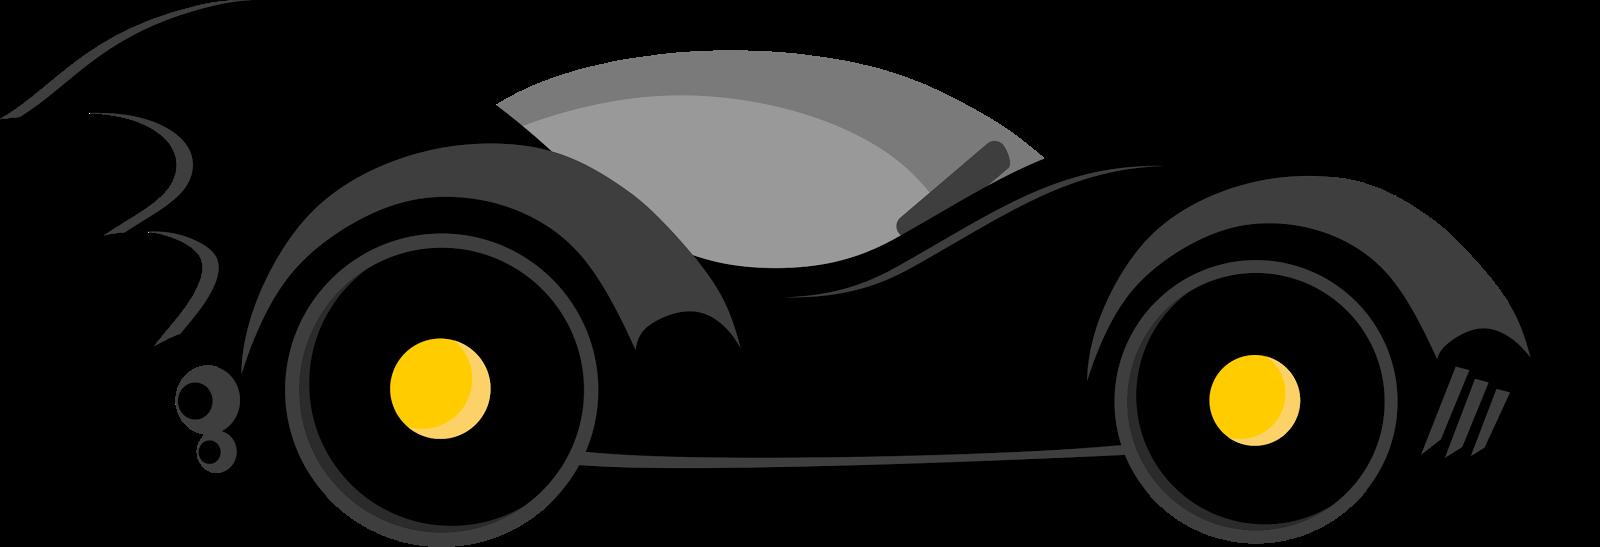 Baby race car clipart clipart royalty free Batman Cute Clip Art. | bat ideas | Pinterest | Batman, Batman party ... clipart royalty free